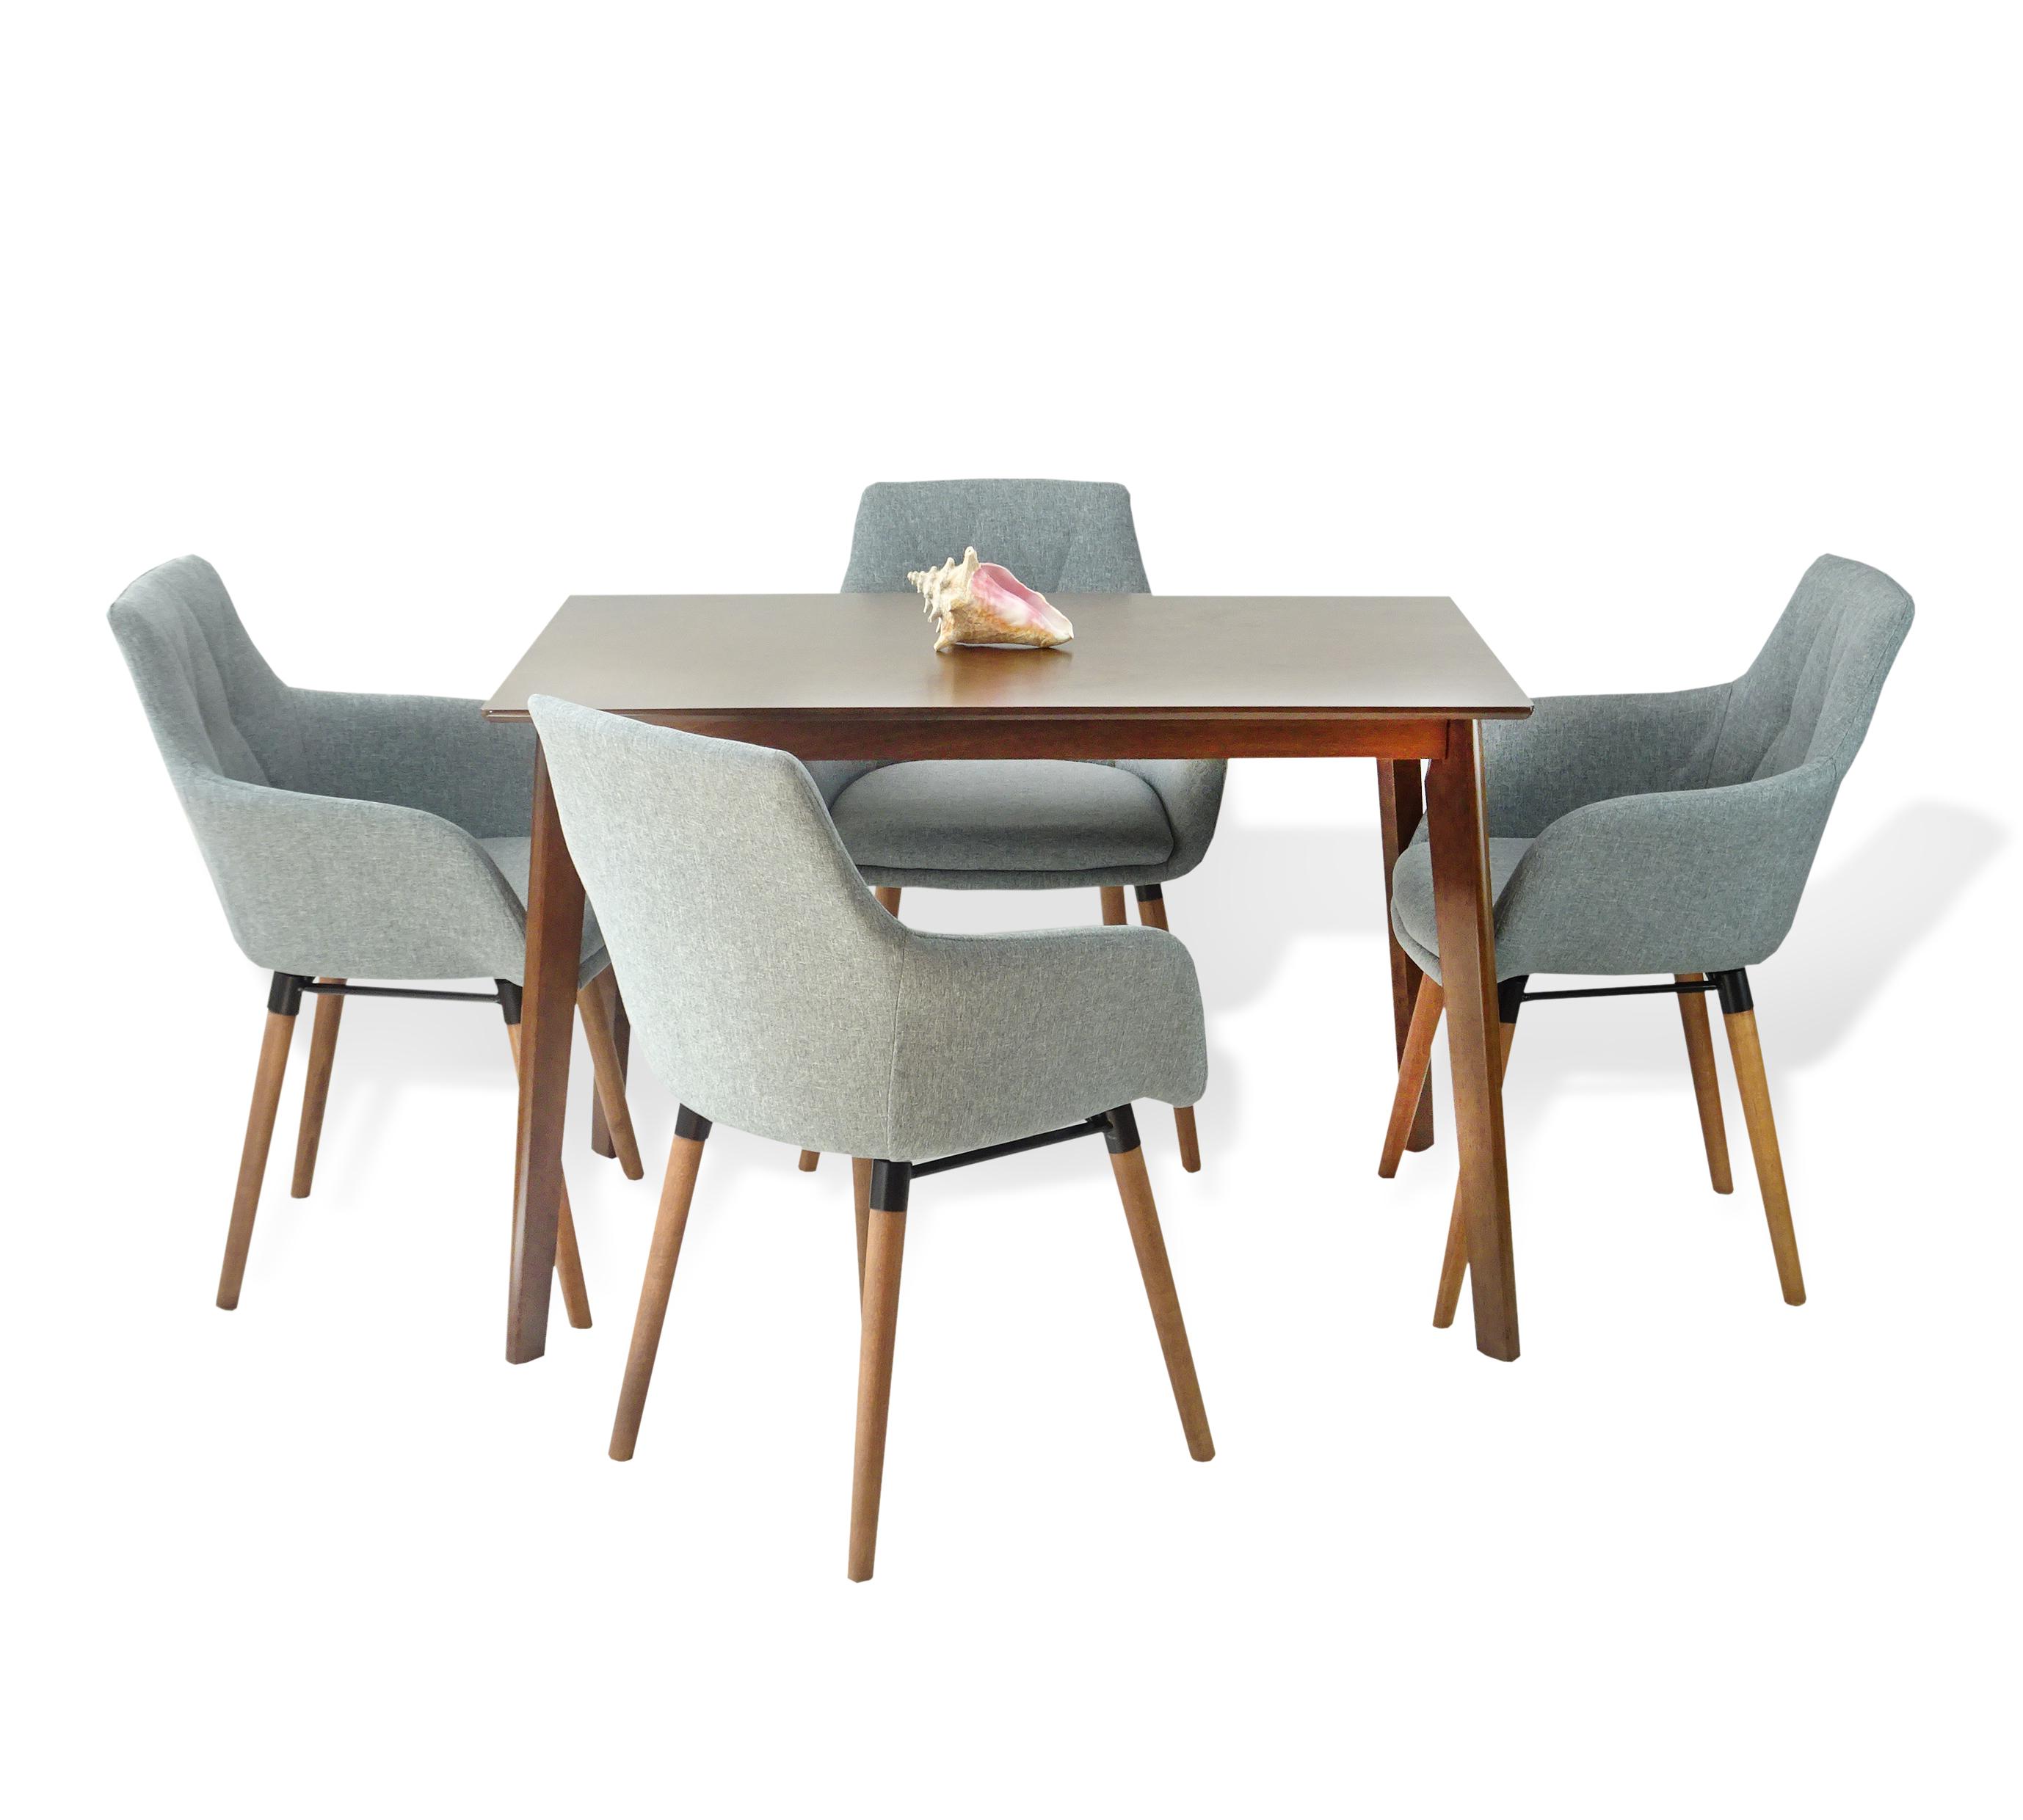 Kitchen Armchairs: Buy Dining Kitchen Modern Alba Armchairs Set Of 4 Wood